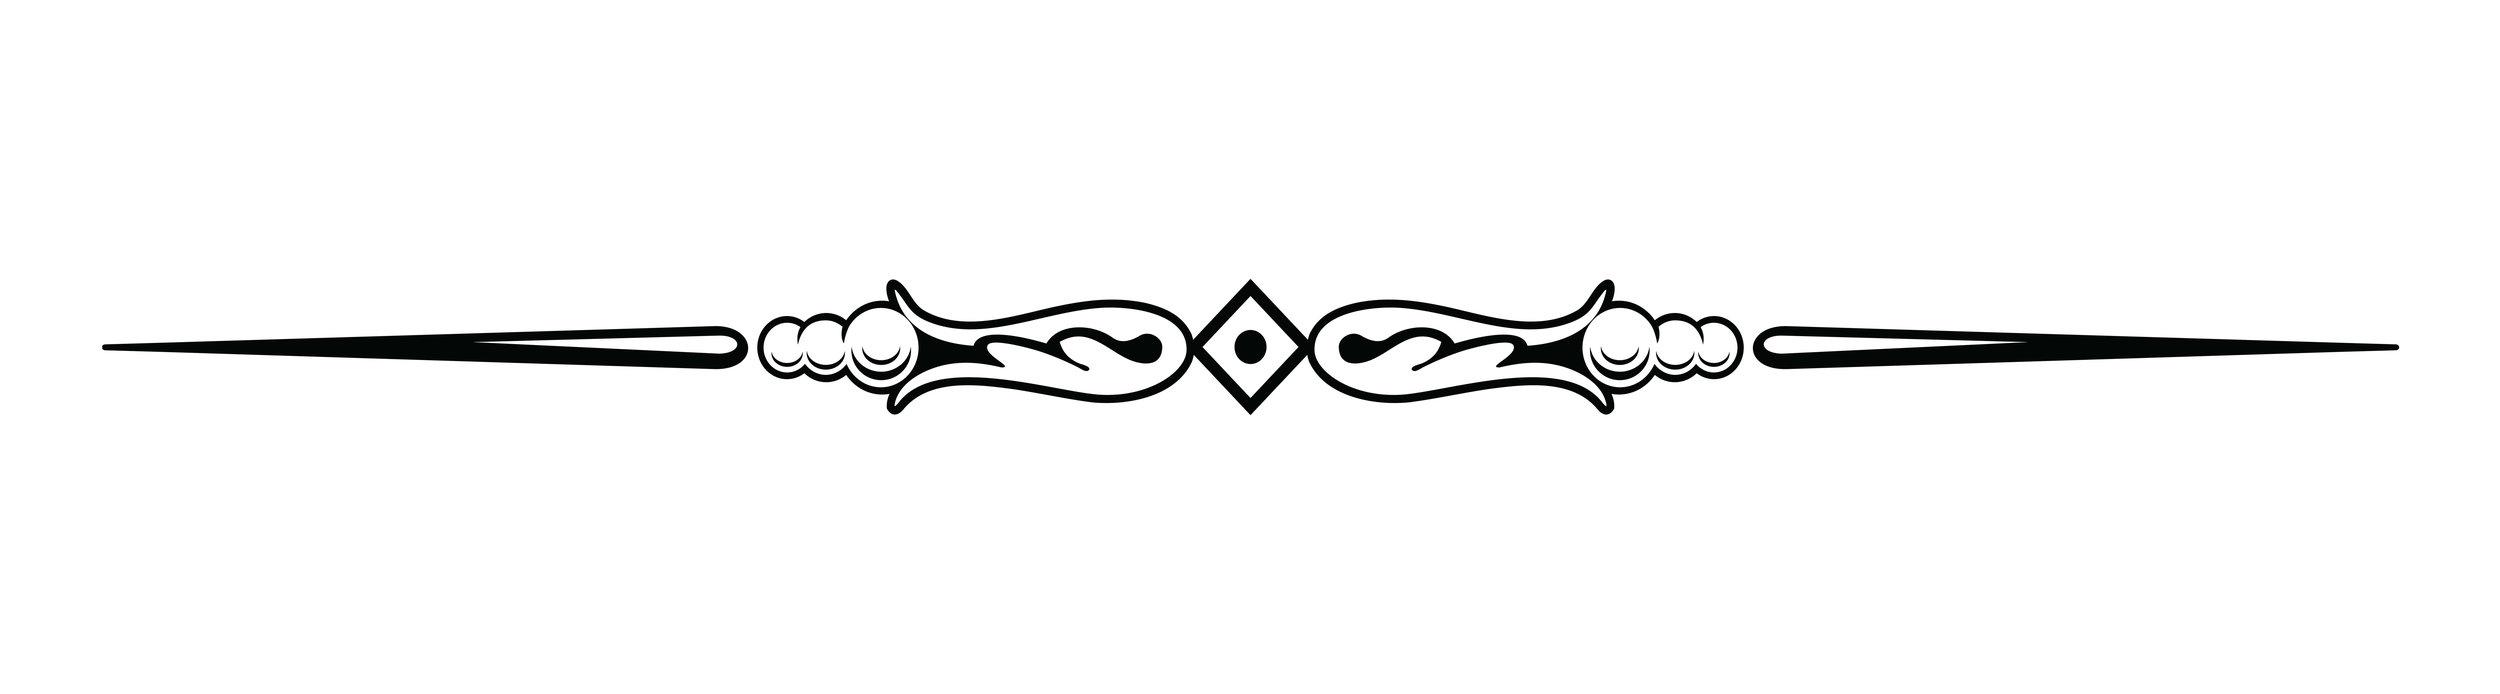 black-line-divider-clipart-1.jpg